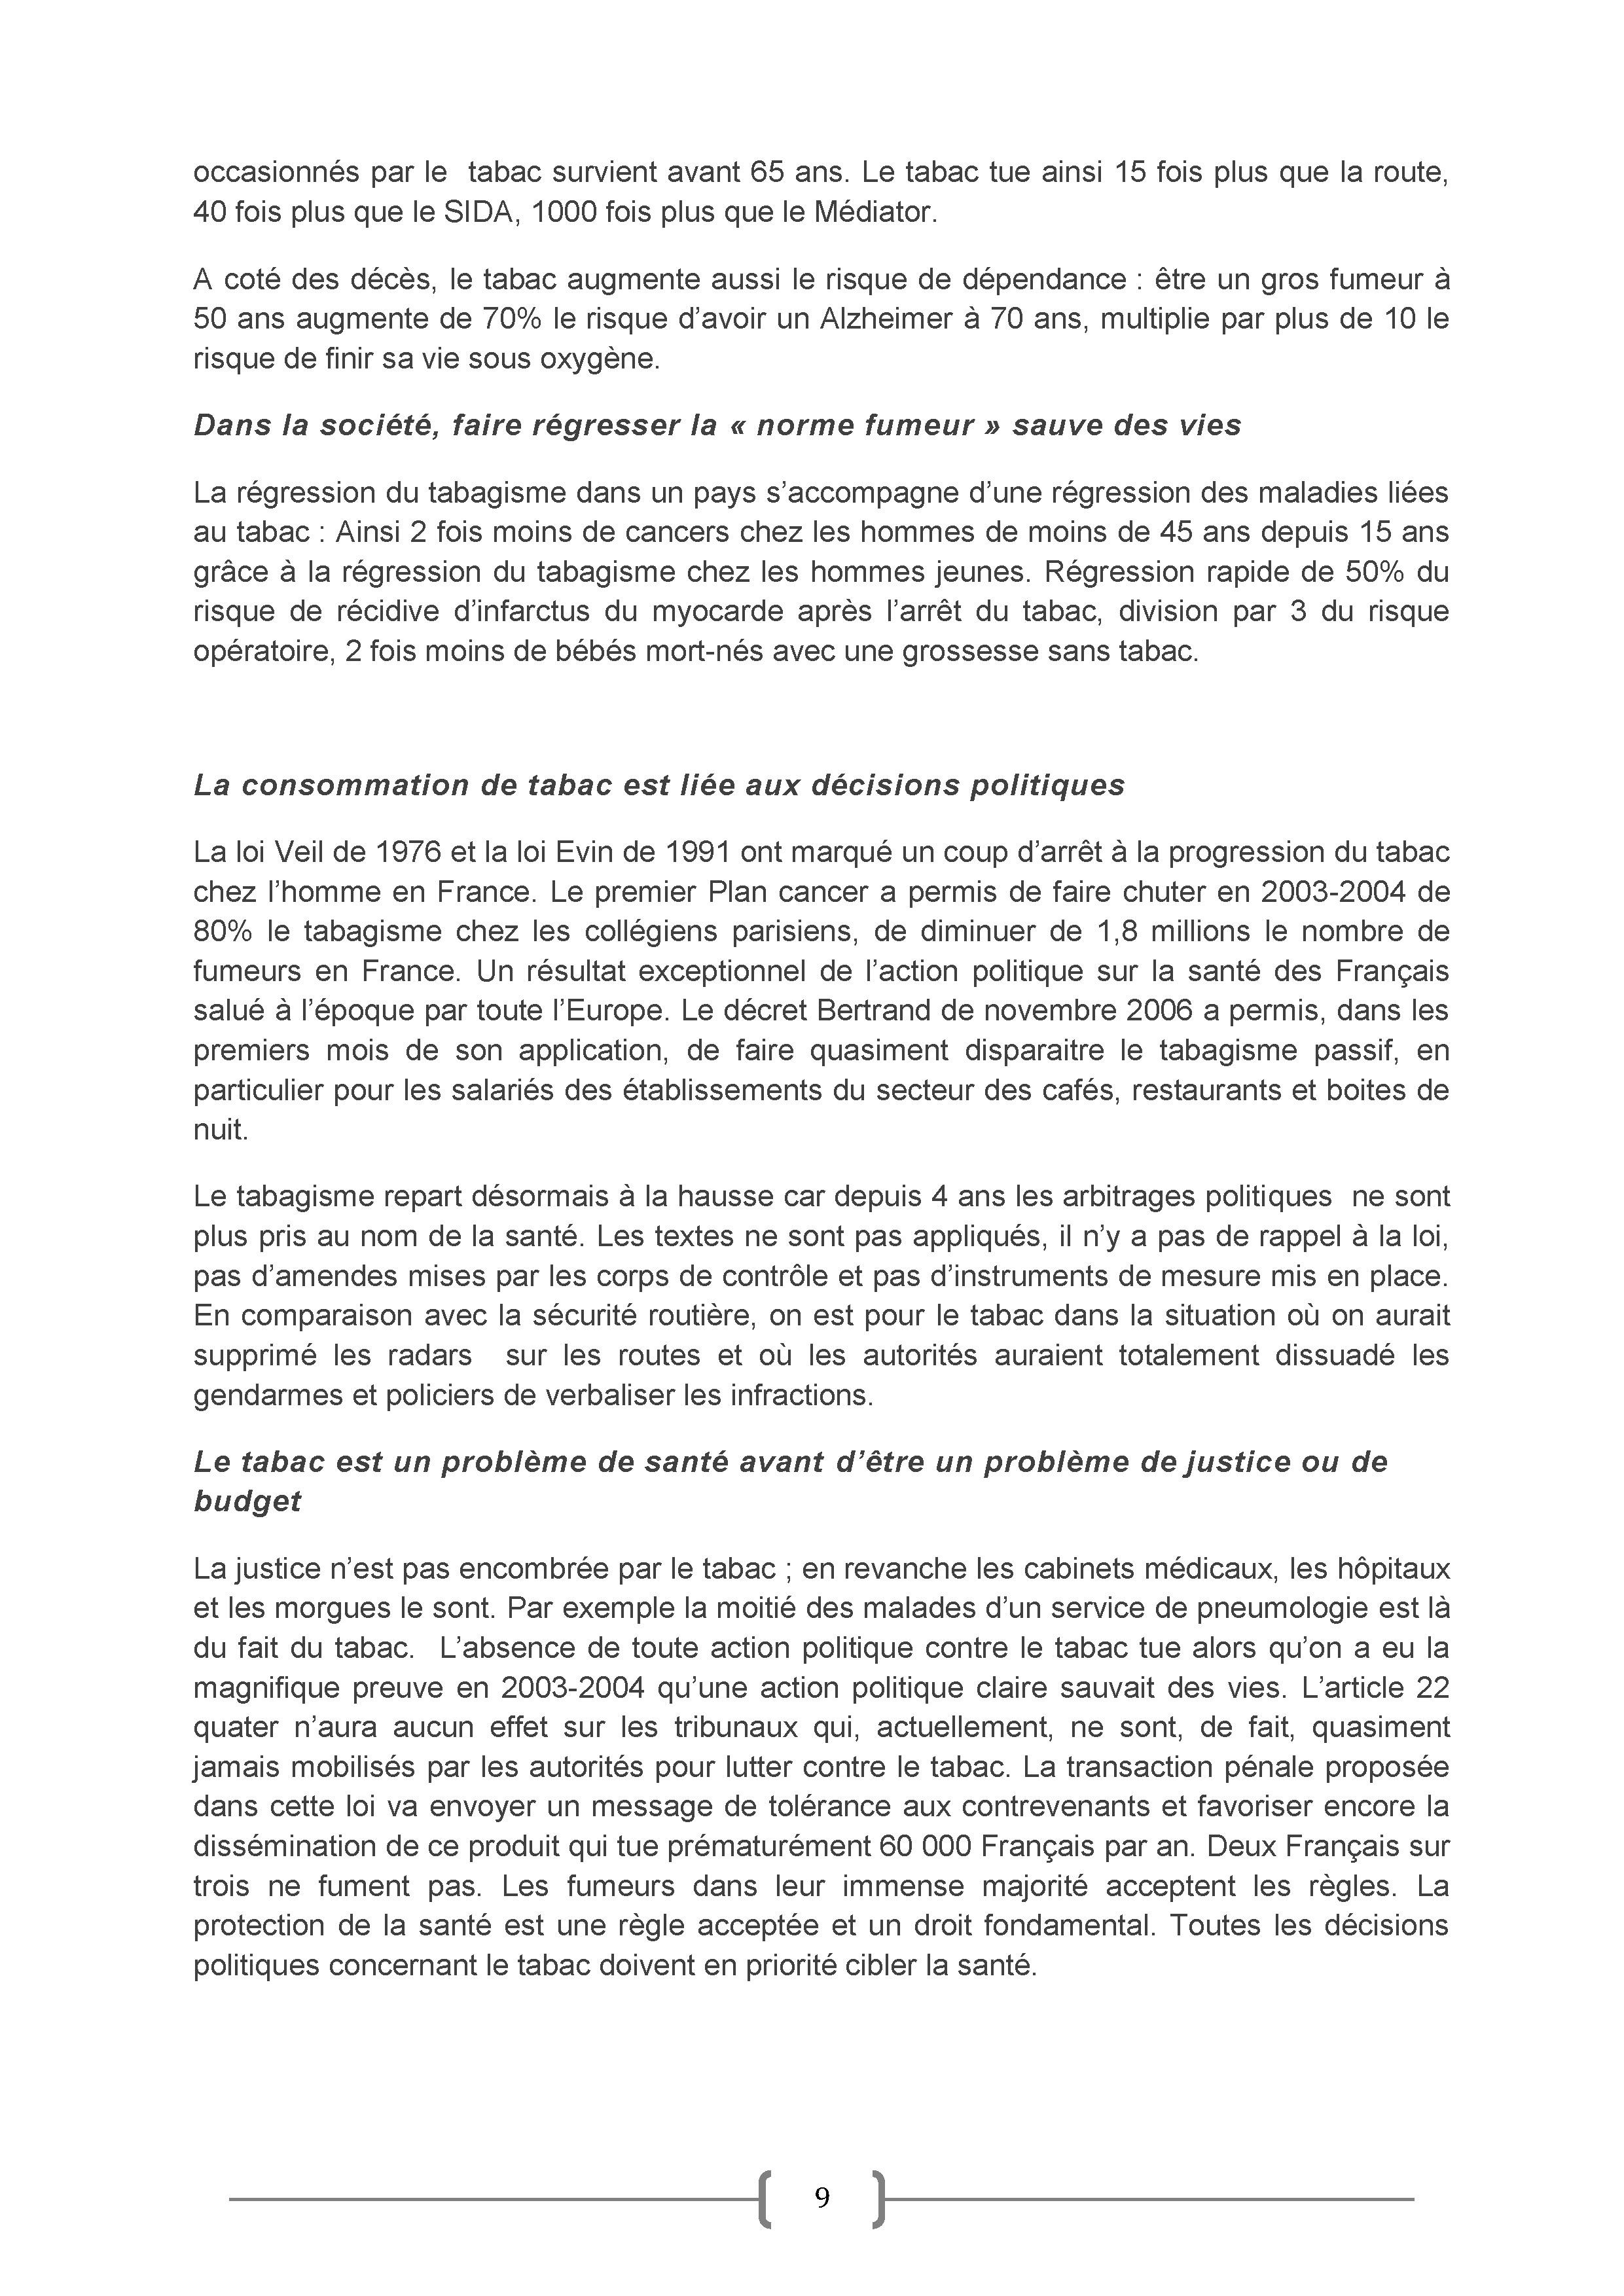 Alliance-DP_projet-loi-article-22-quater_05juil2011_Page_9.jpg